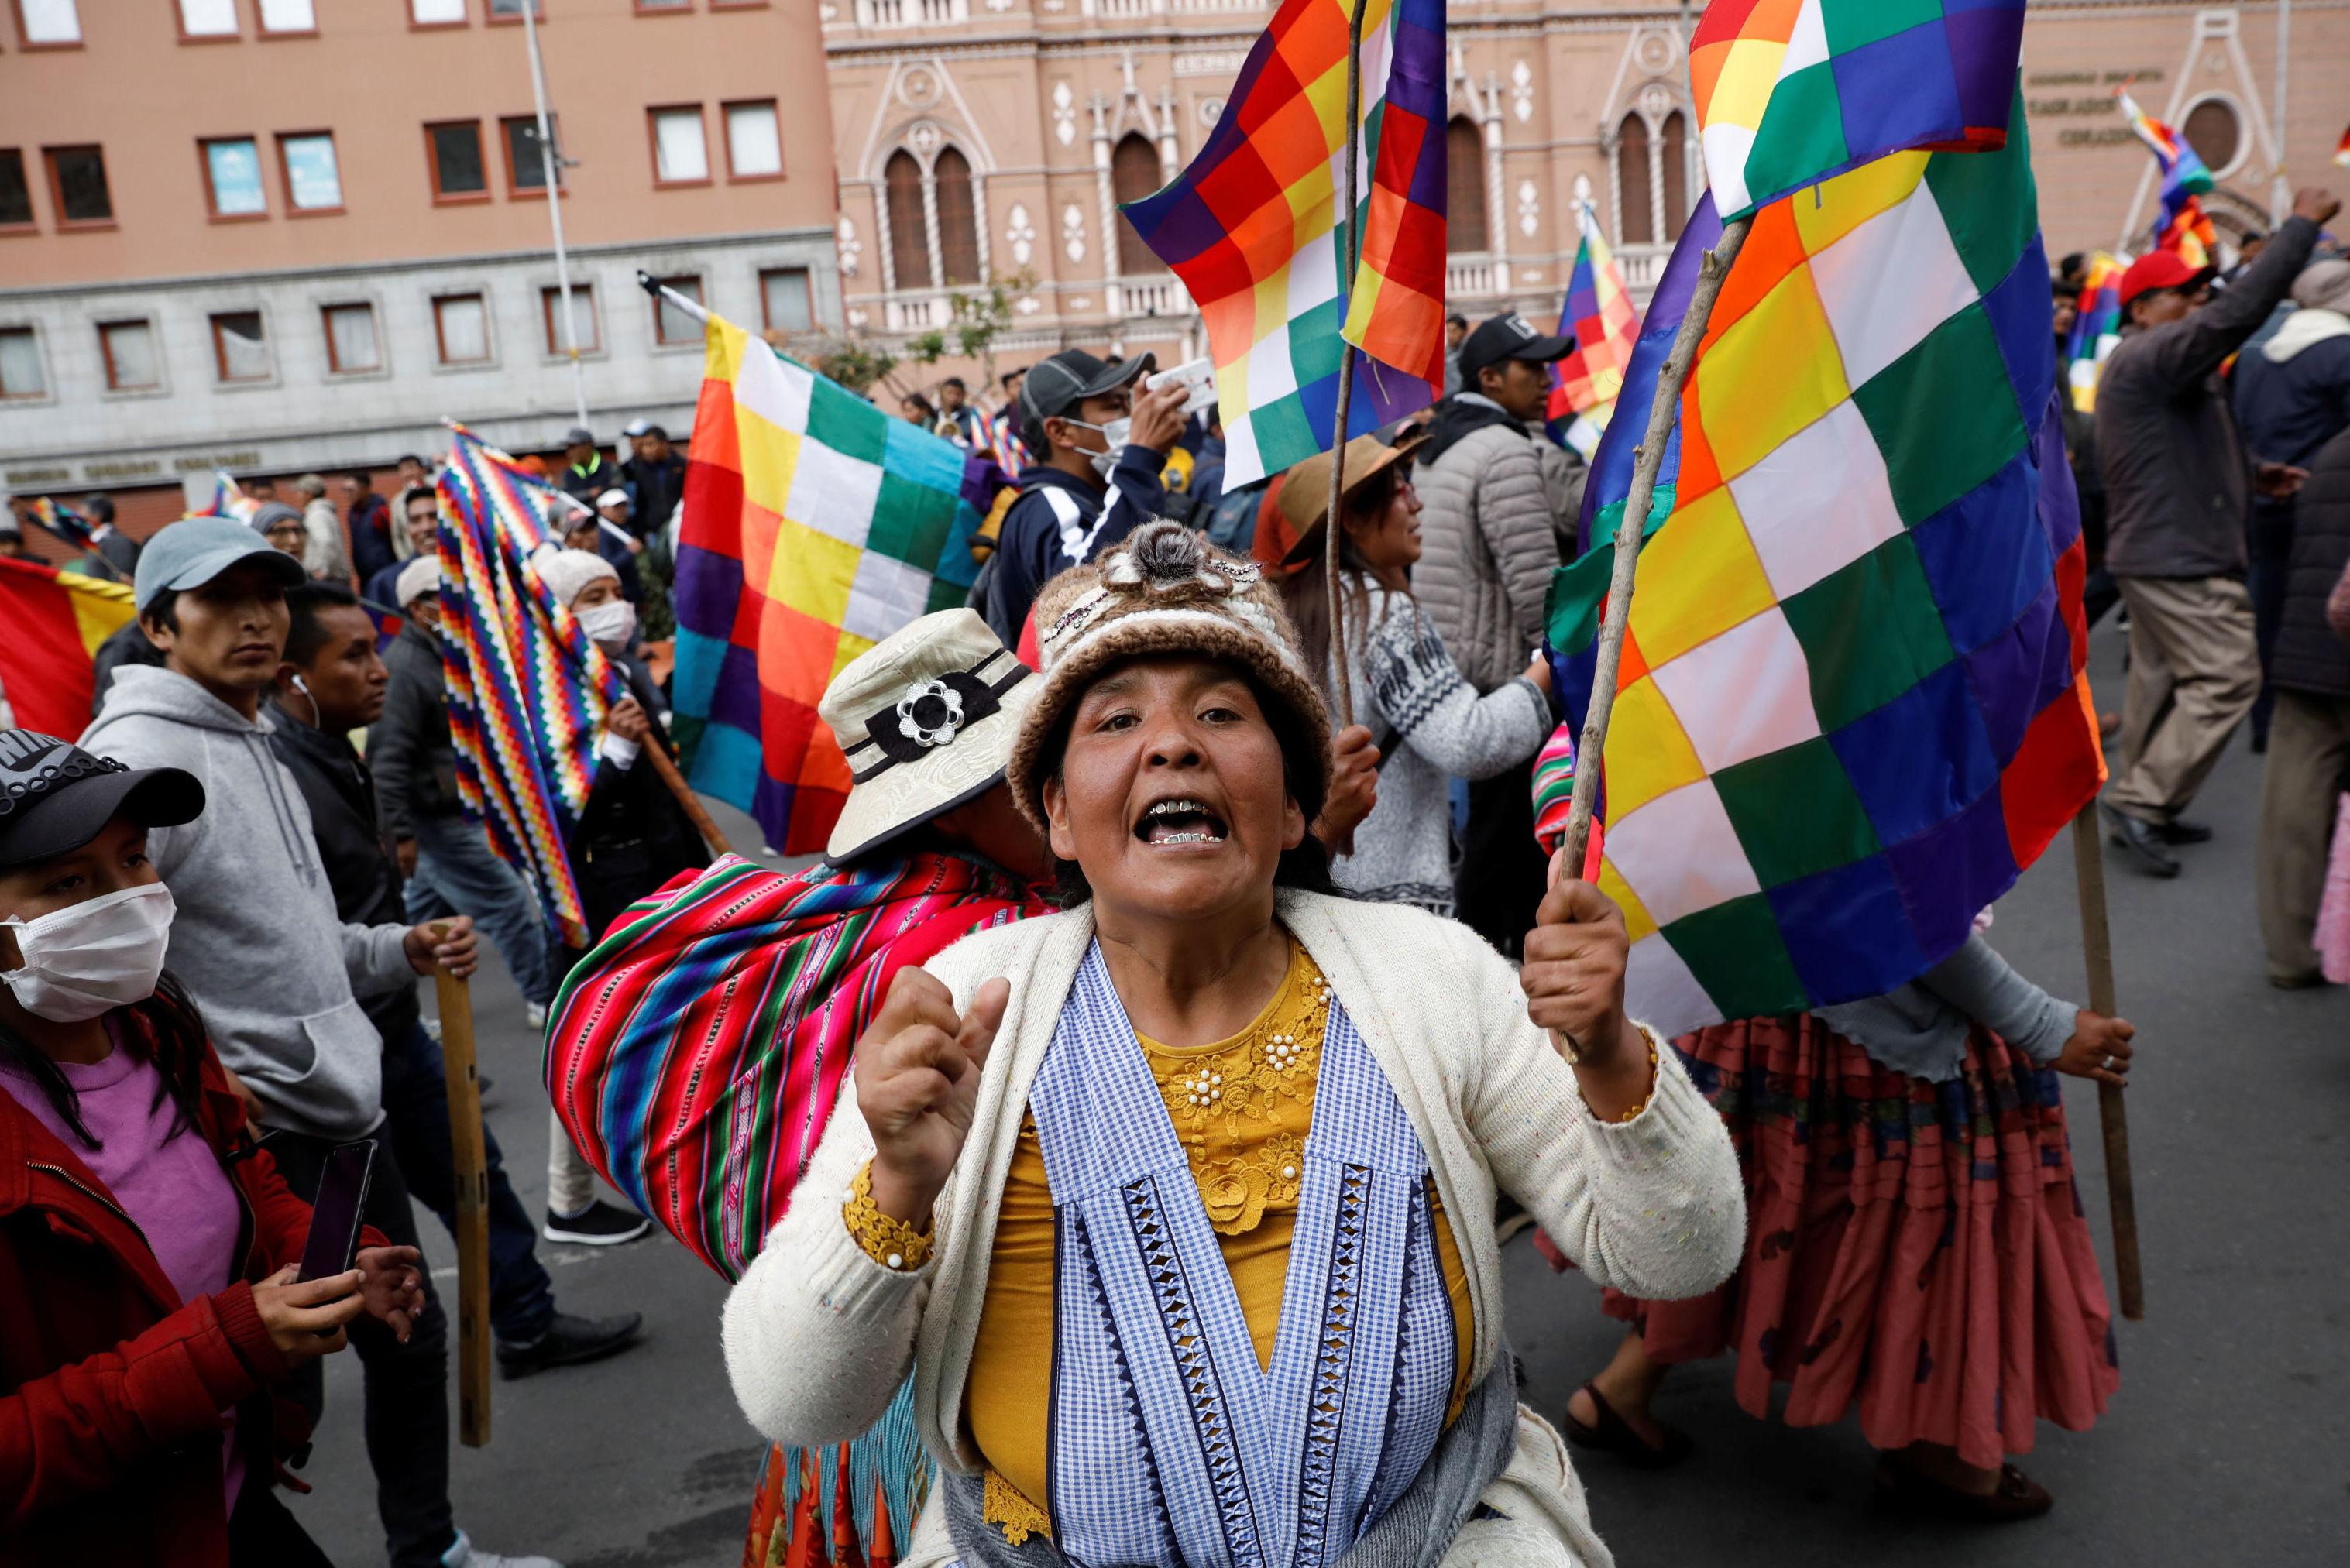 Apoiadores do presidente deposto Evo Morales manifestam nas ruas de La Paz, empunhando a bandeira Wiphala, em 12 de novembro de 2019